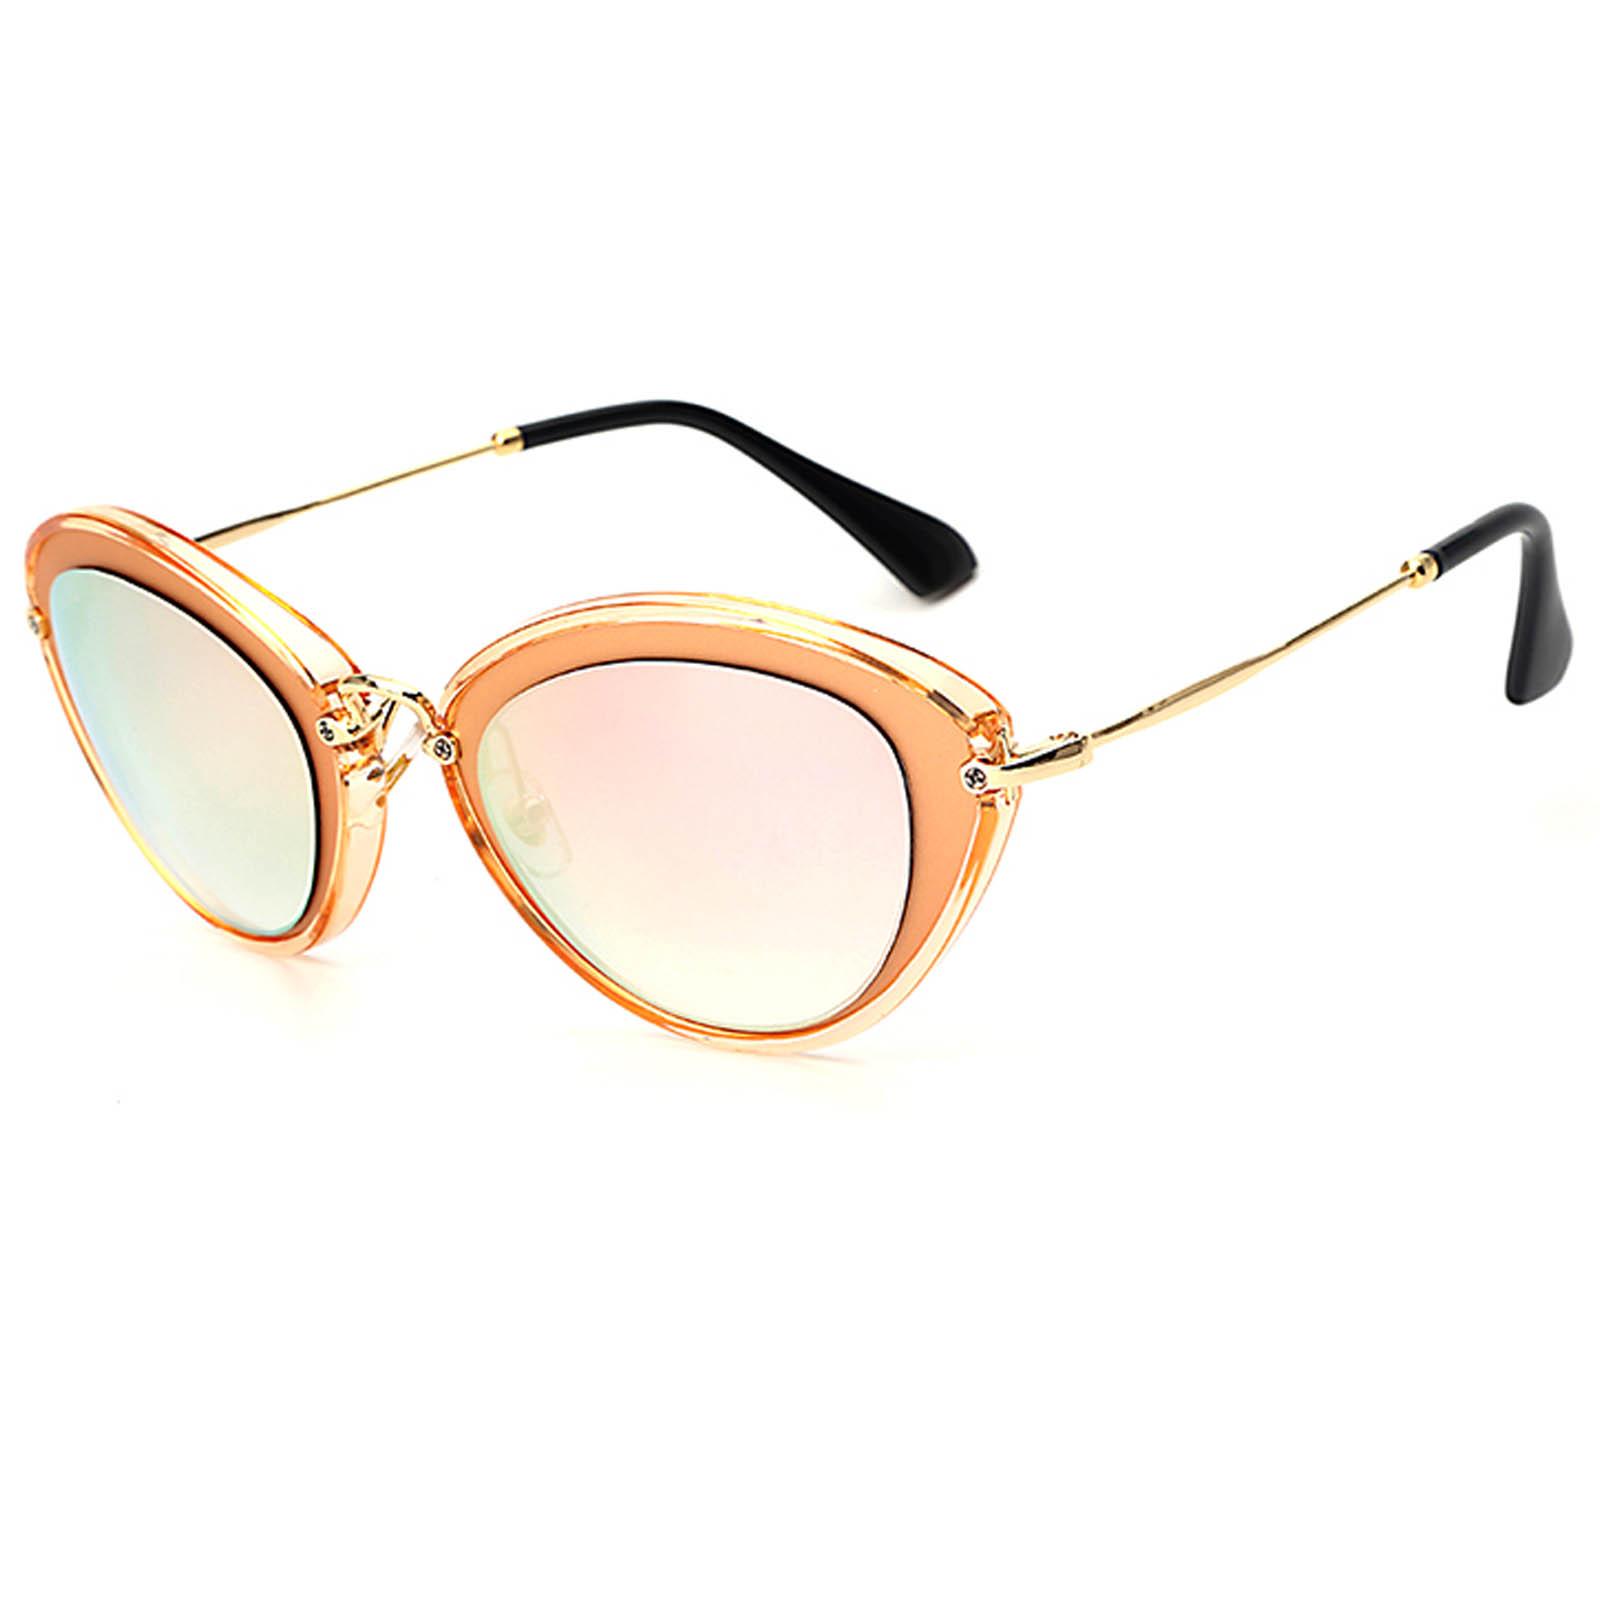 OWL ® 003 C5 Cat Eyewear Sunglasses Women\'s Men\'s Metal Orange Frame ...